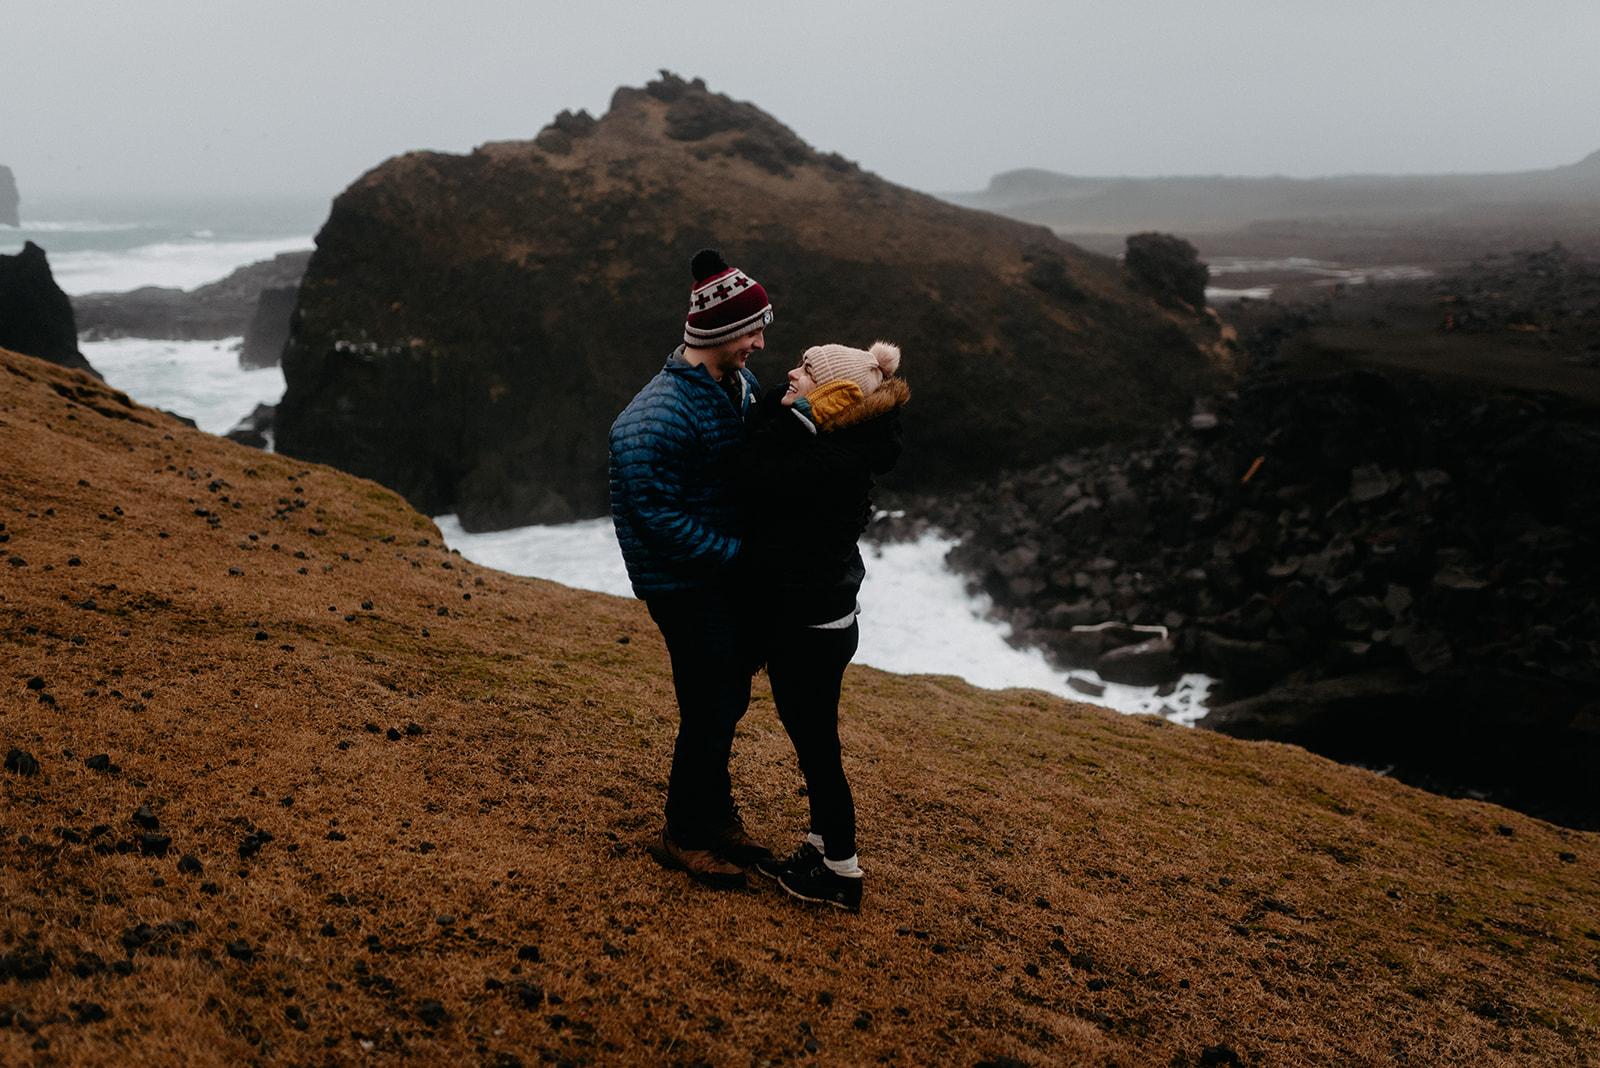 Mack & Michael - Sesja na Islandii 28 alebosco islandia mm 28